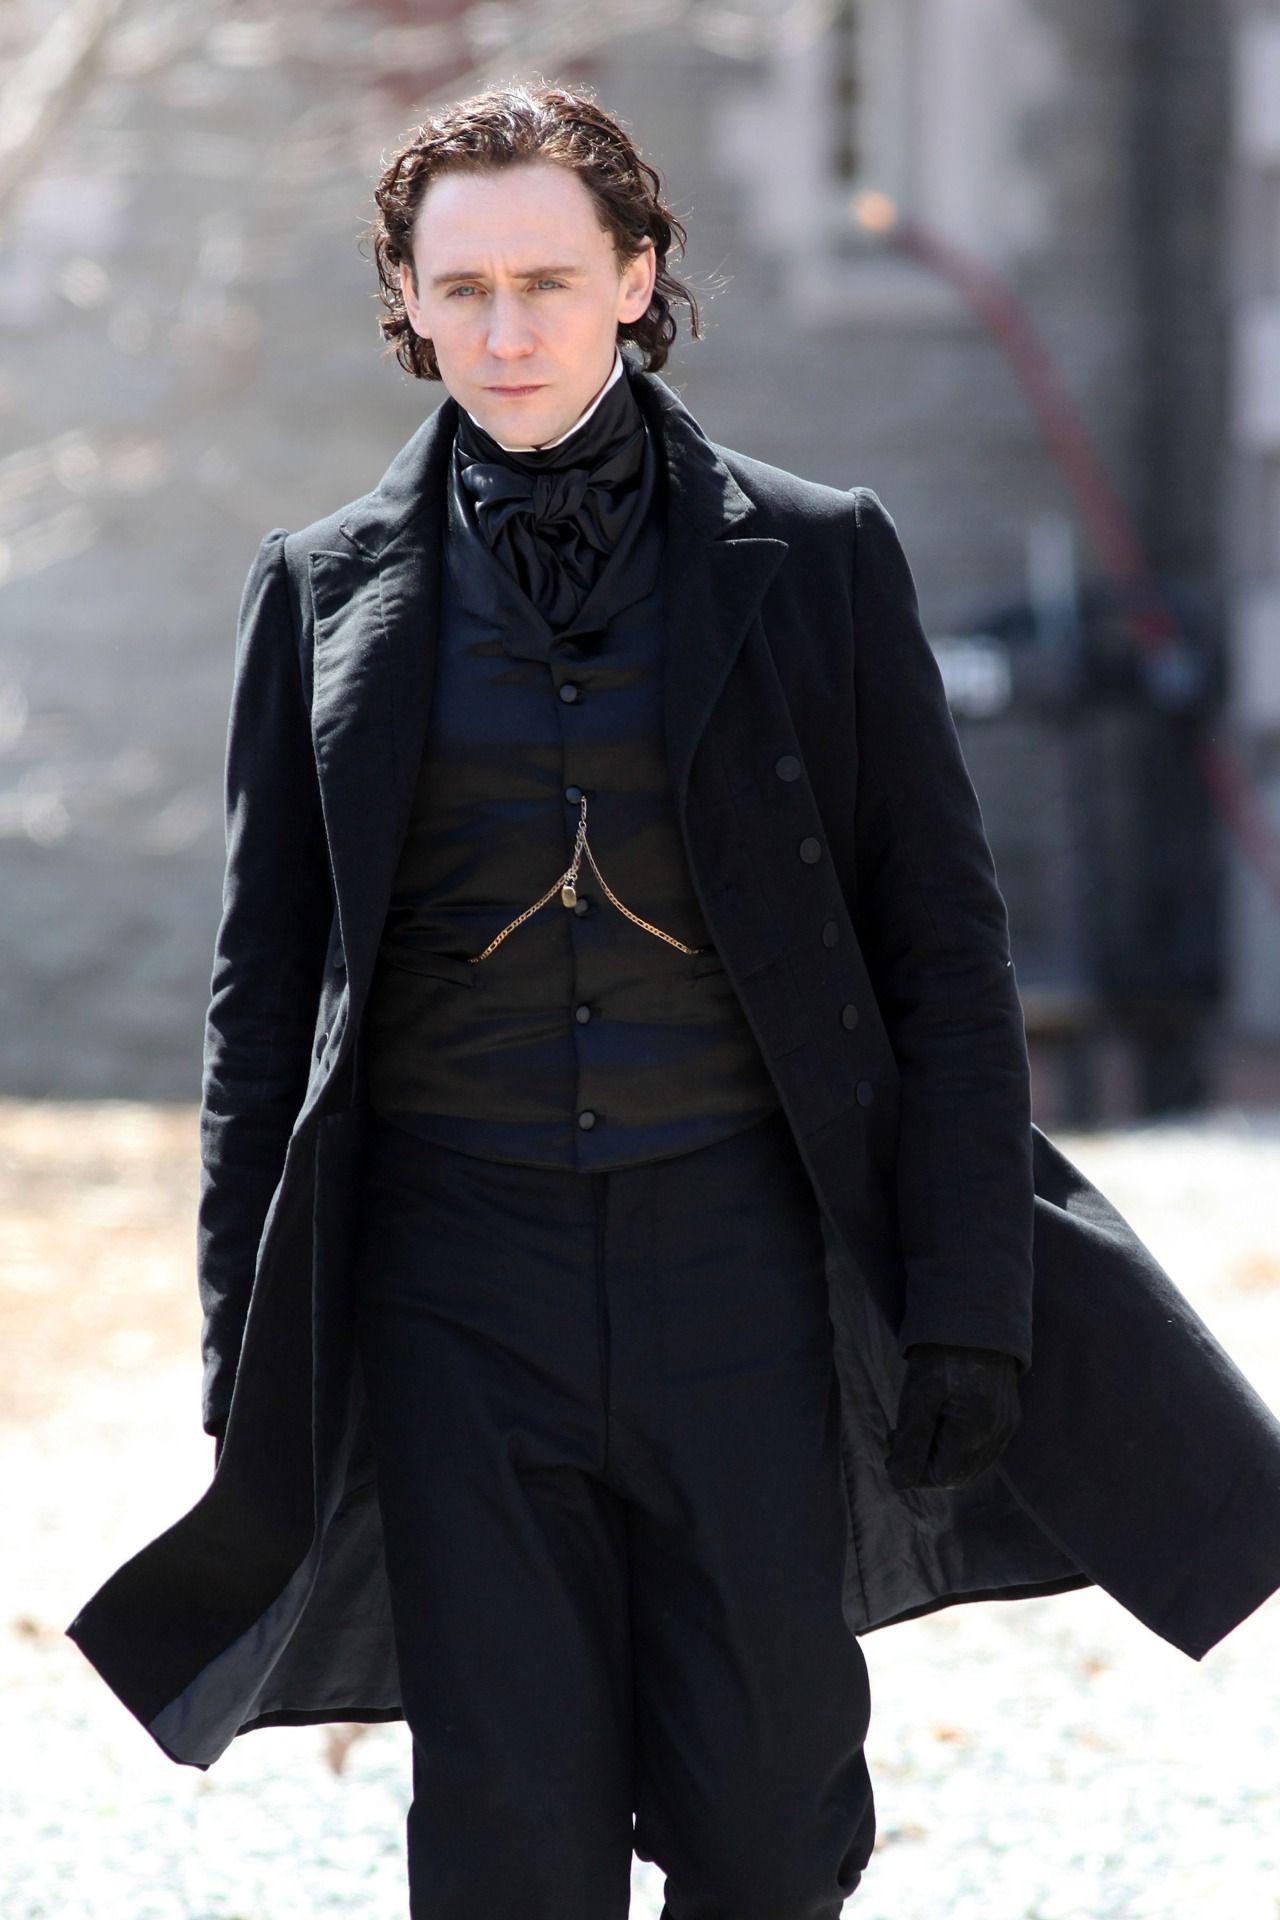 Tom Hiddleston films scenes for the new horror movie 'Crimson Peak' in Toronto on April 17, 2014 [HQ]